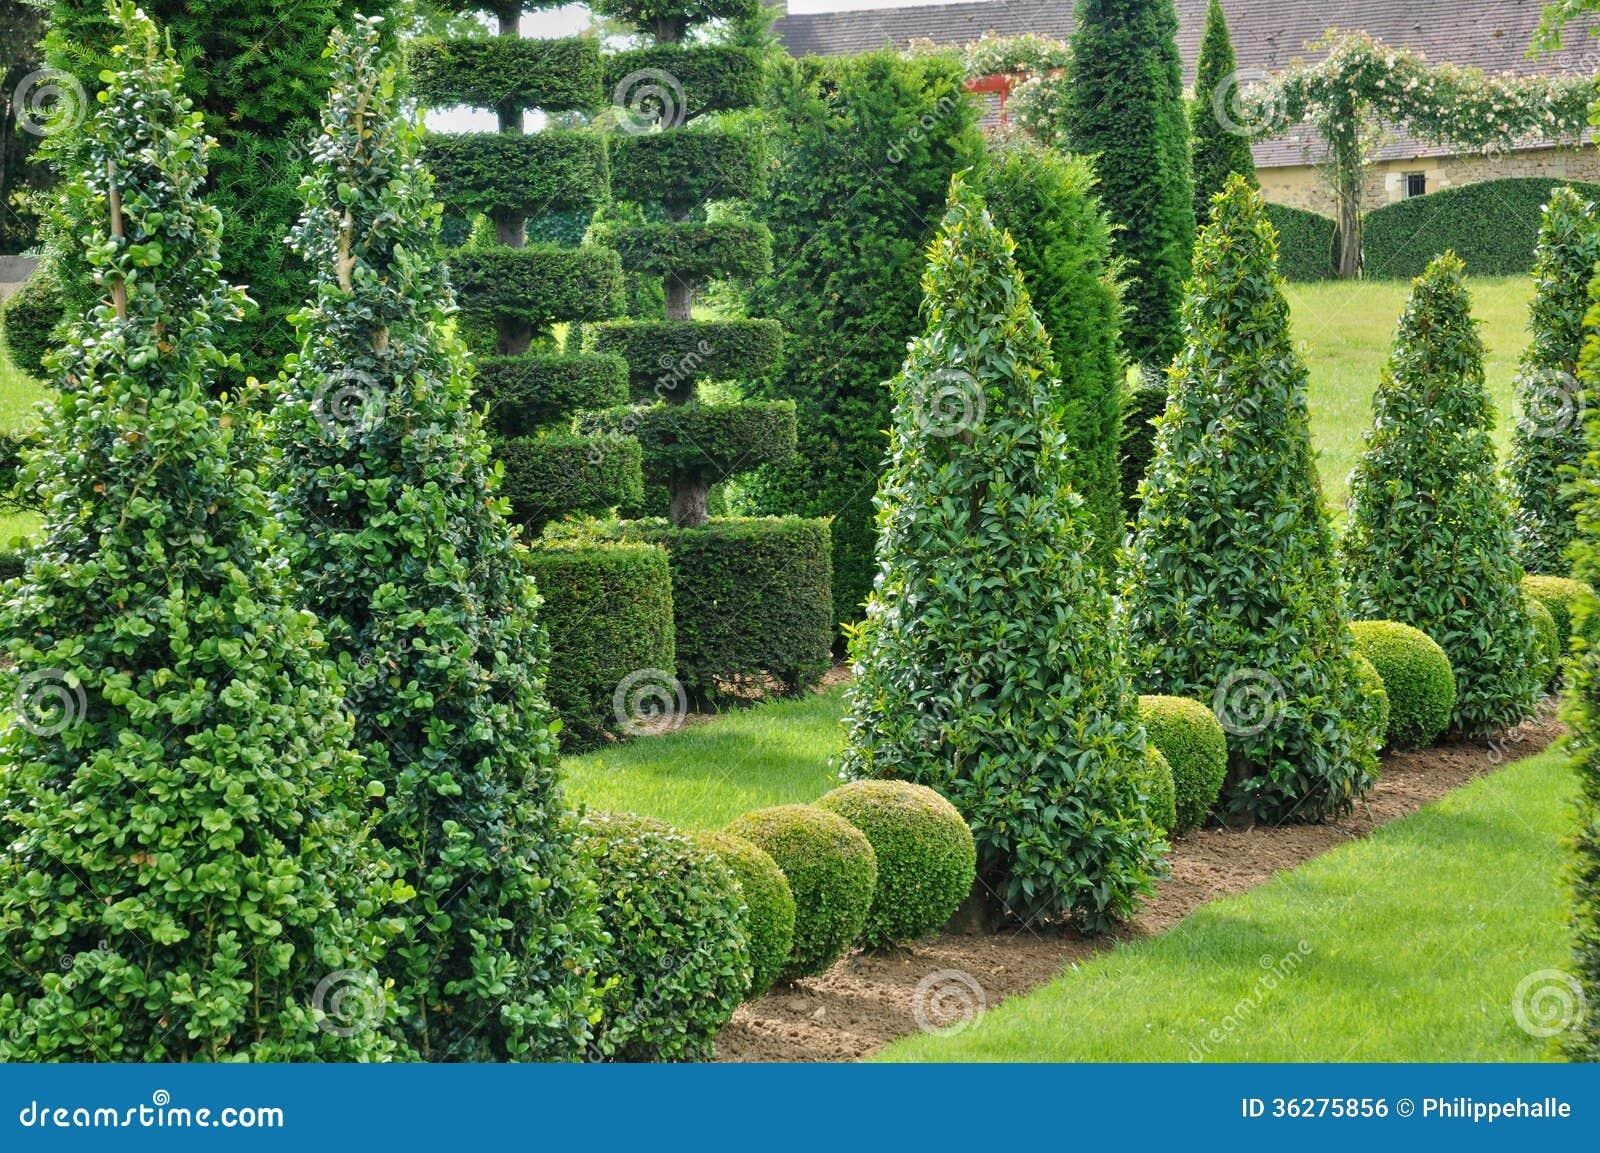 France picturesque jardins du manoir d eyrignac in dordogne stock photo image 36275856 - Jardins du manoir d eyrignac ...